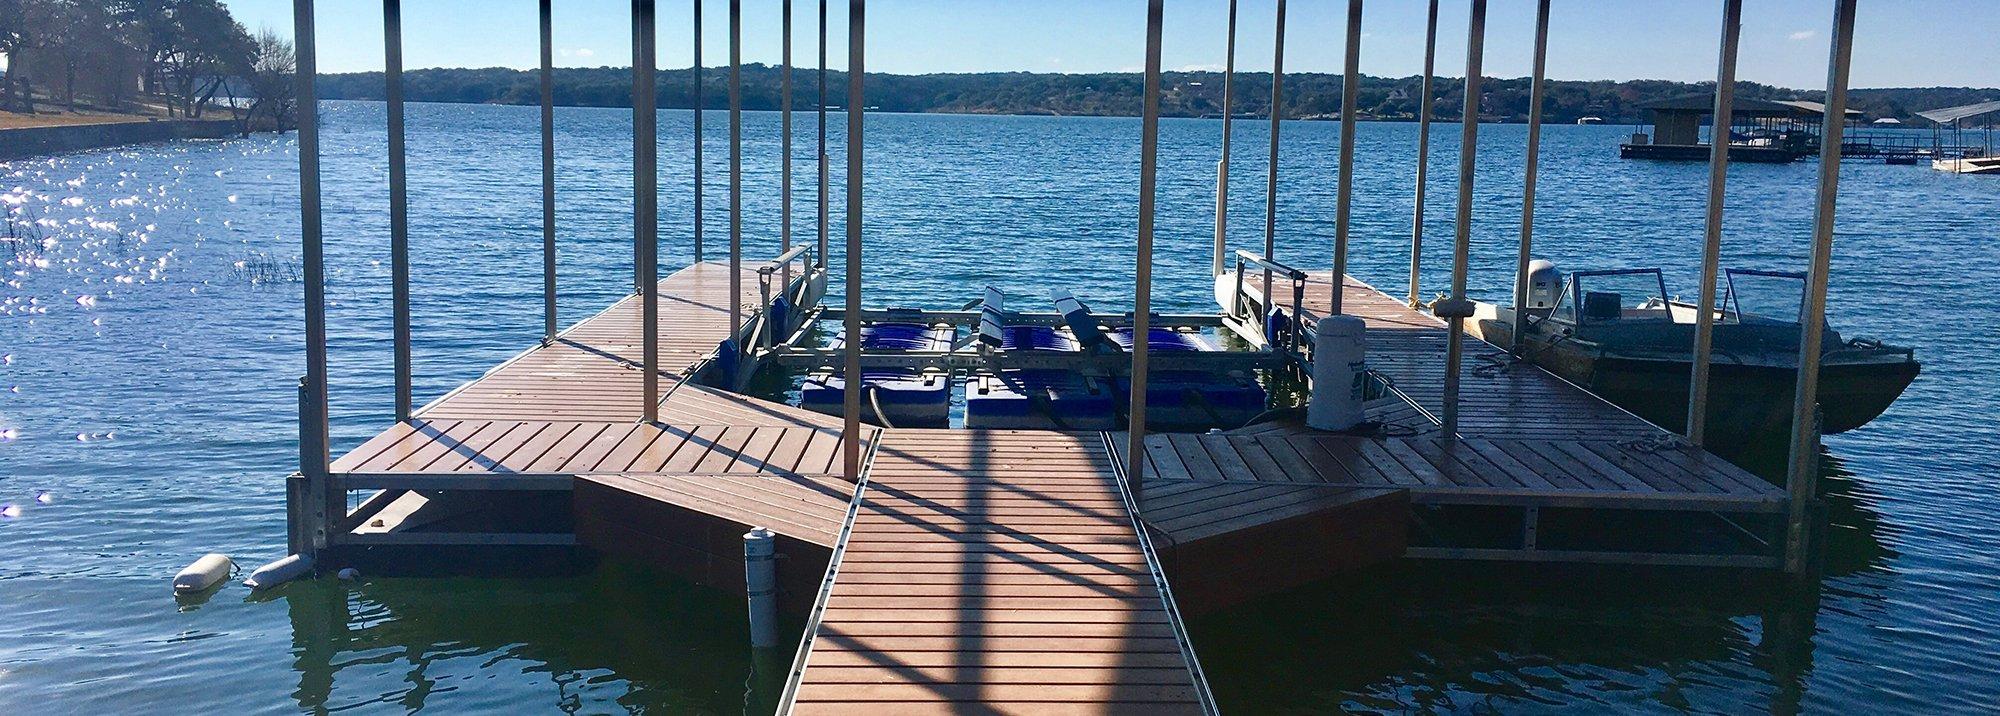 Chap Marine - Lake Travis Marine Services